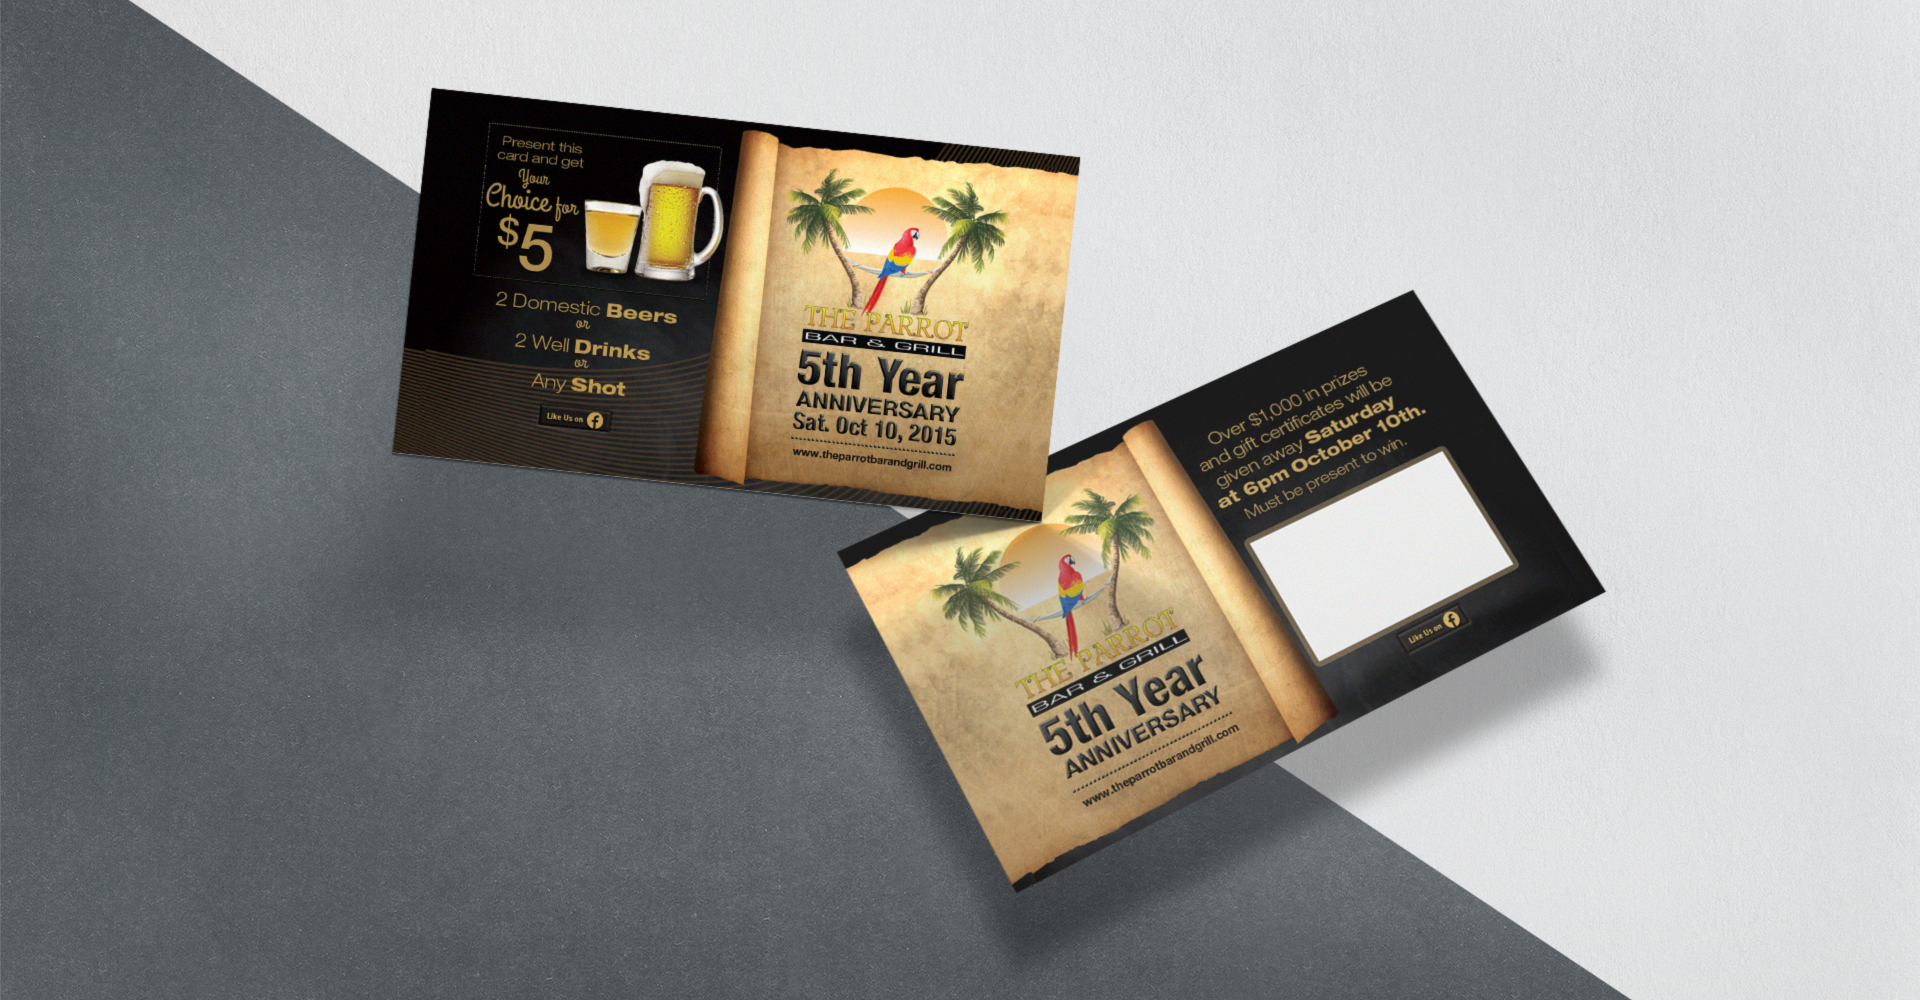 The Parrot Bar & Grill branding